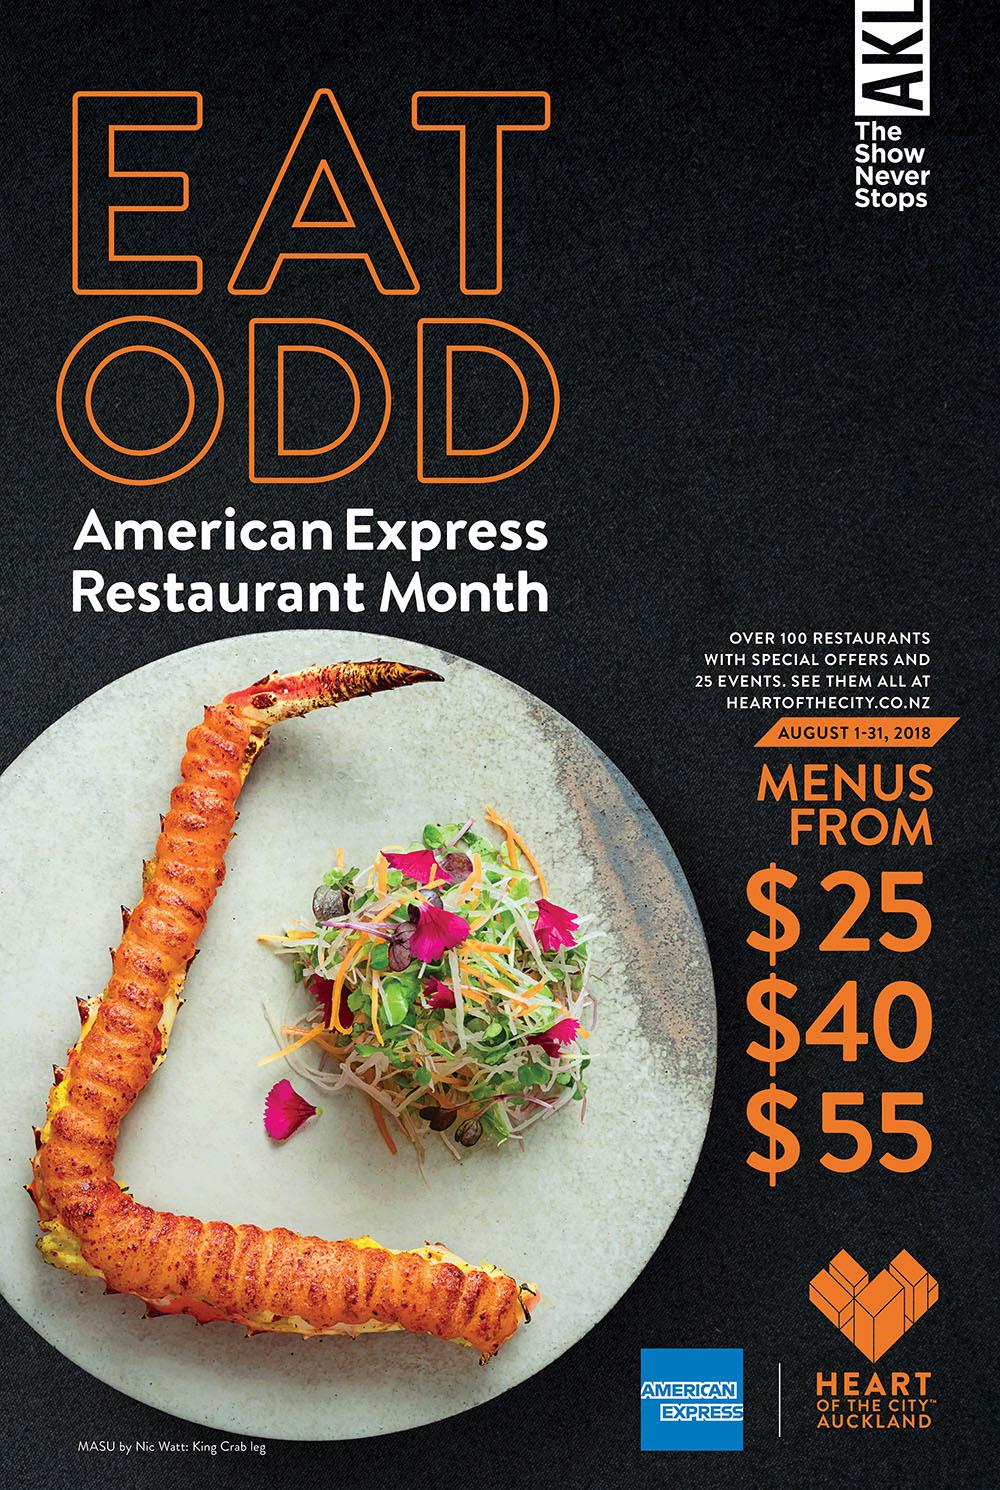 HOC1582_Restaurant Month_2018_OOH_Adshel_metrolite_MASU.jpg